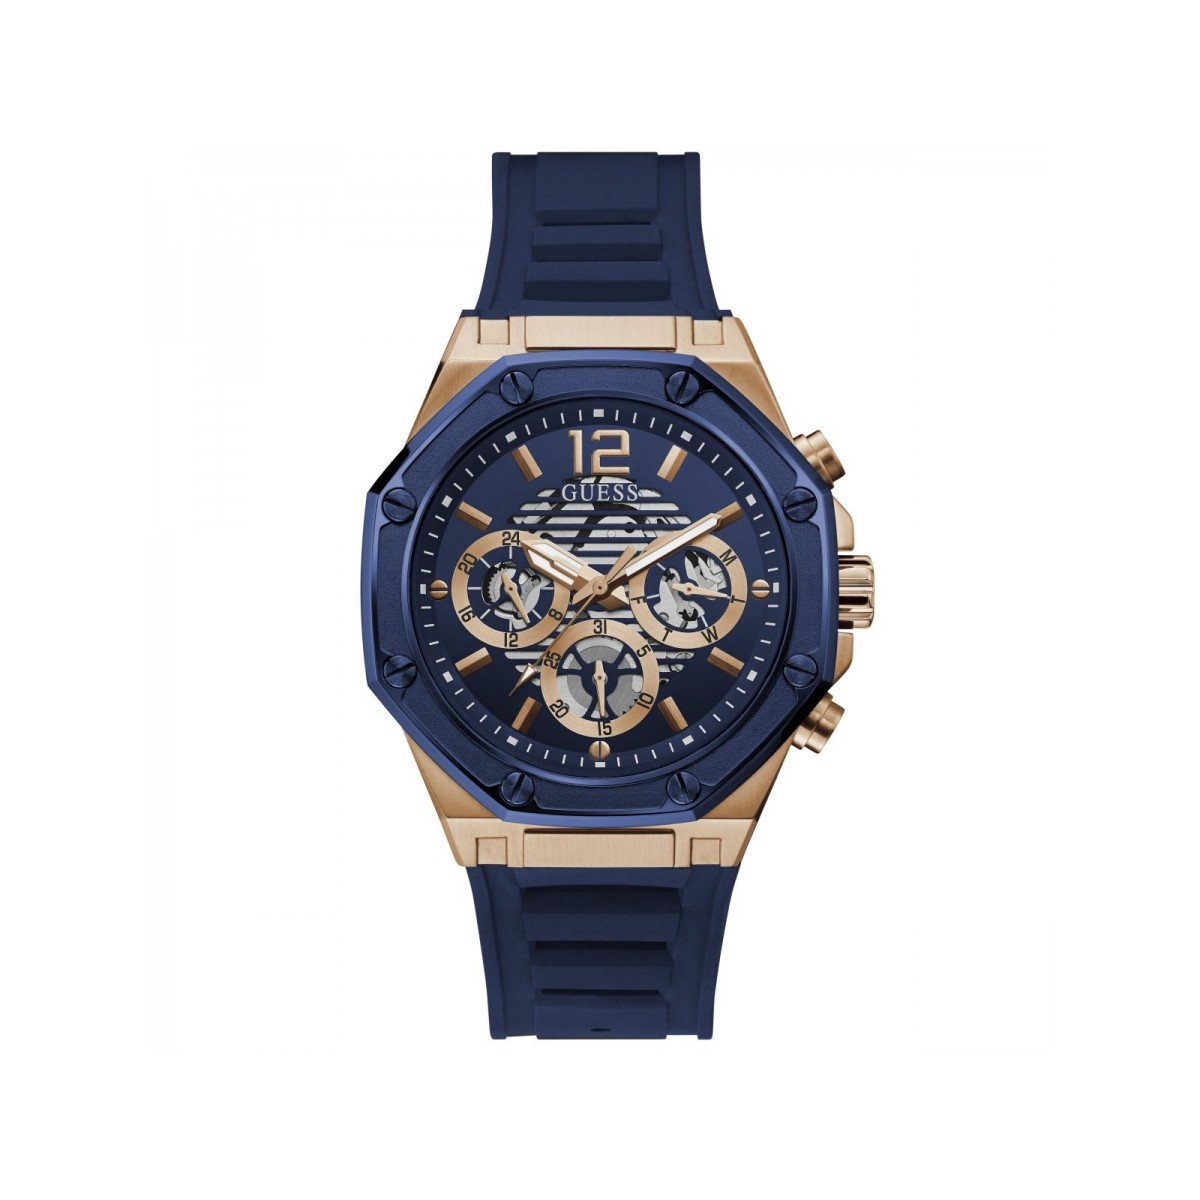 https://www.gaberjoyeria.com/6299-thickbox_default/reloj-guess-momentum.jpg